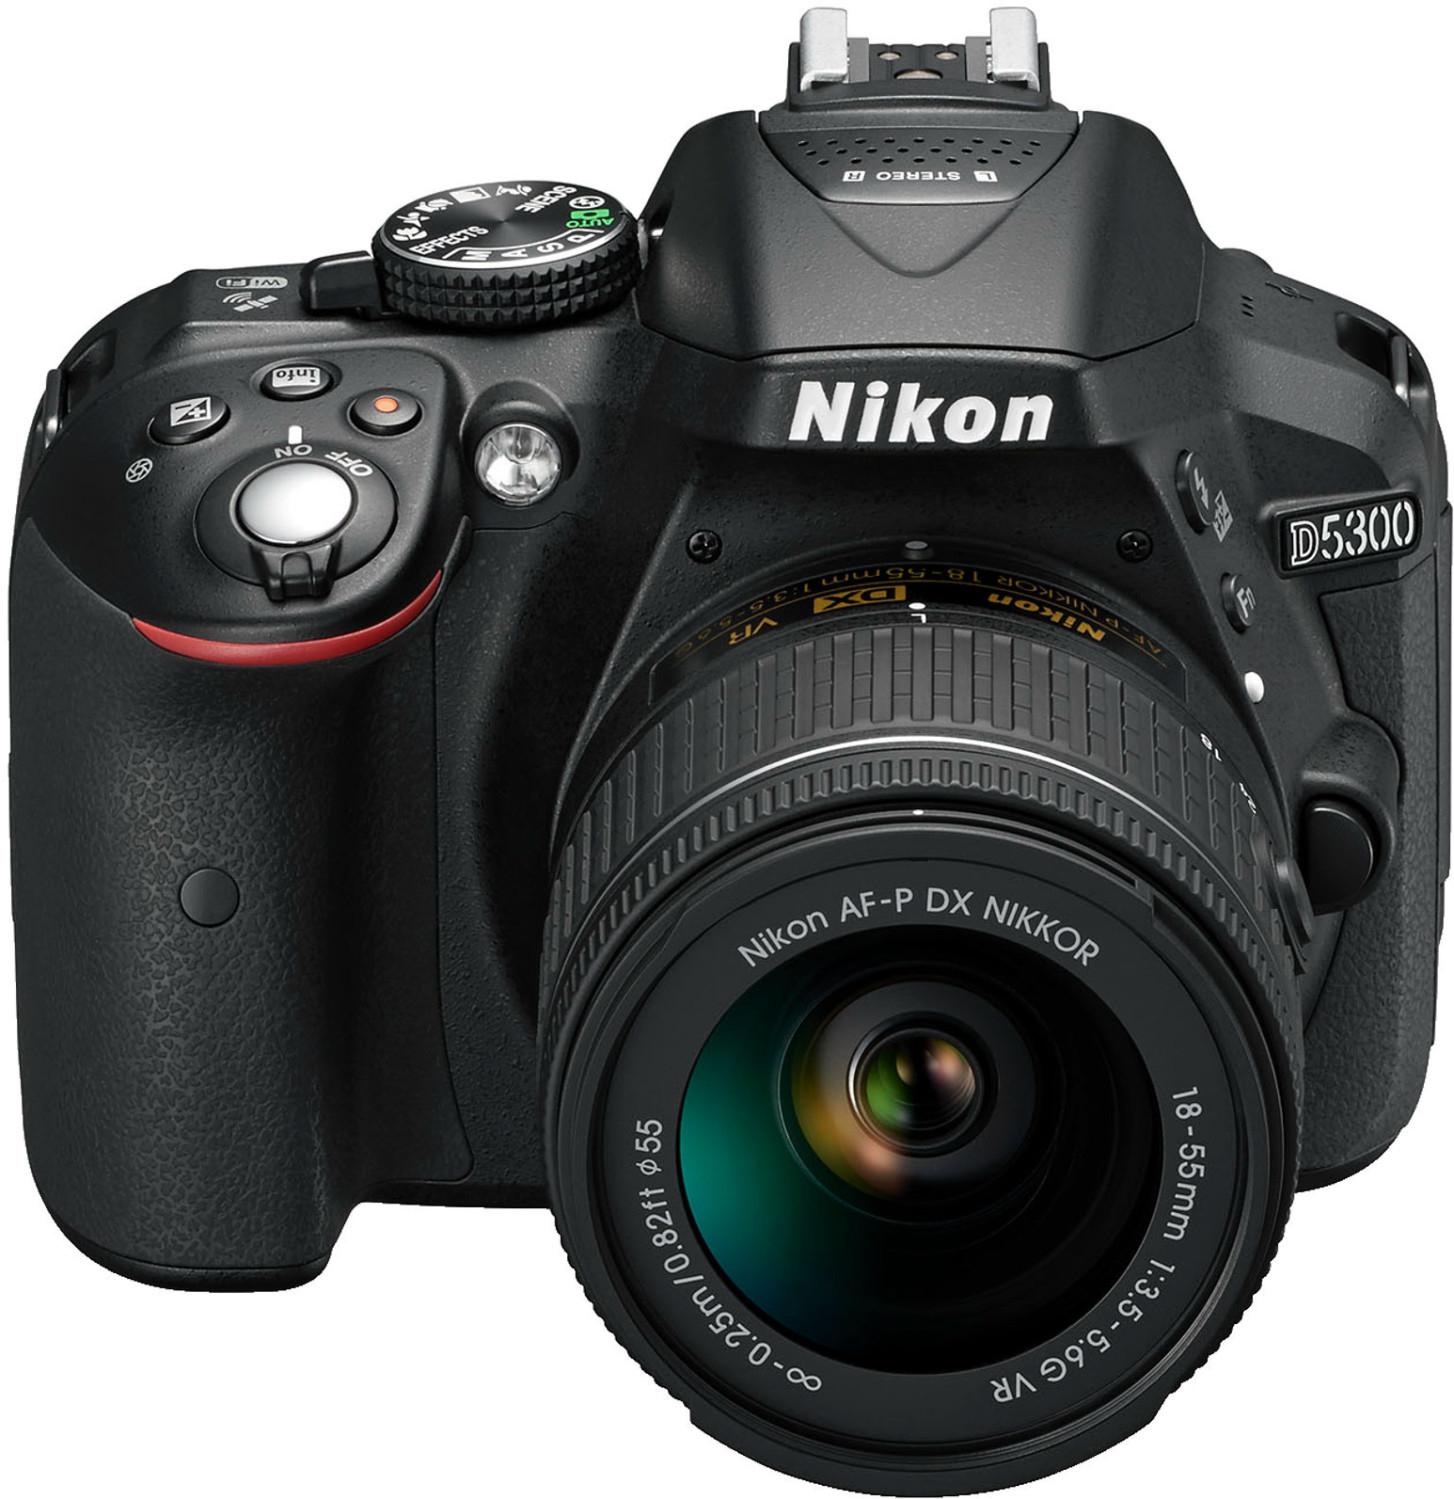 Nikon D5300 digitale Spiegelreflexkamera mit 18-55mm Objektiv (24,2 Megapixel, f/3,5-5,6, Bildstabilistator, Filmen in 1080/60fps)